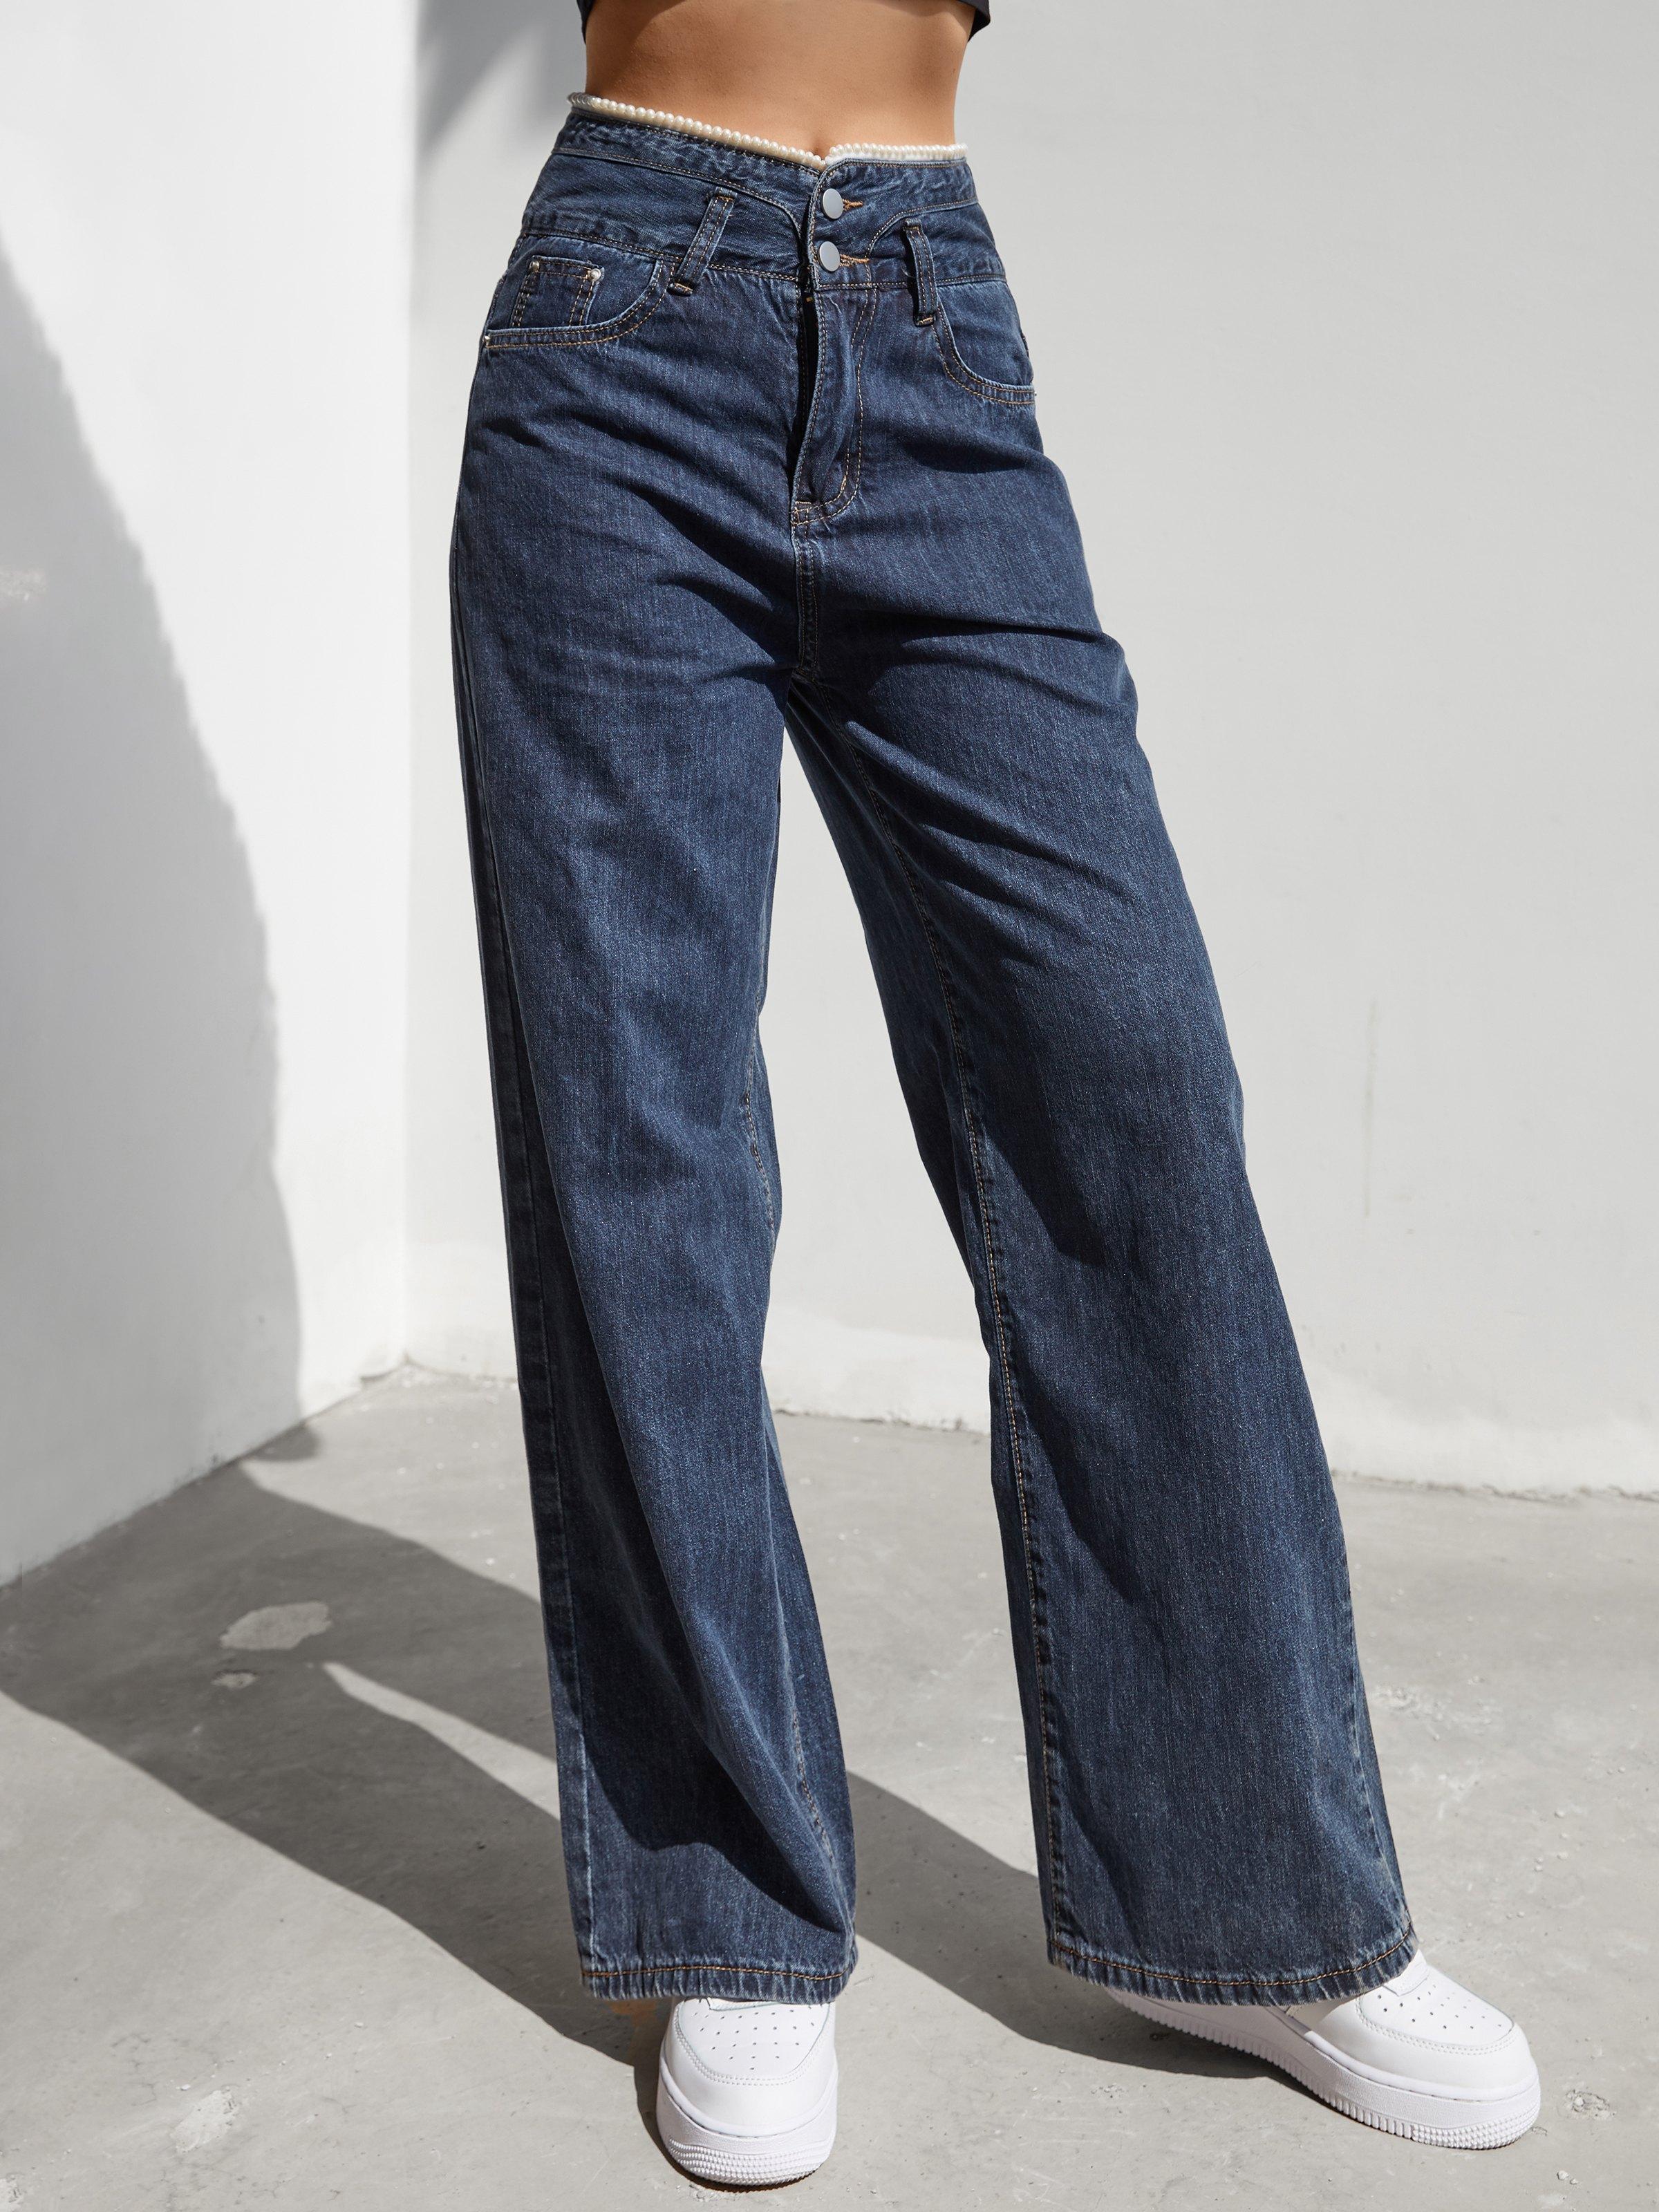 Lace Trim High Waist Mom Jeans - Navy Blue L